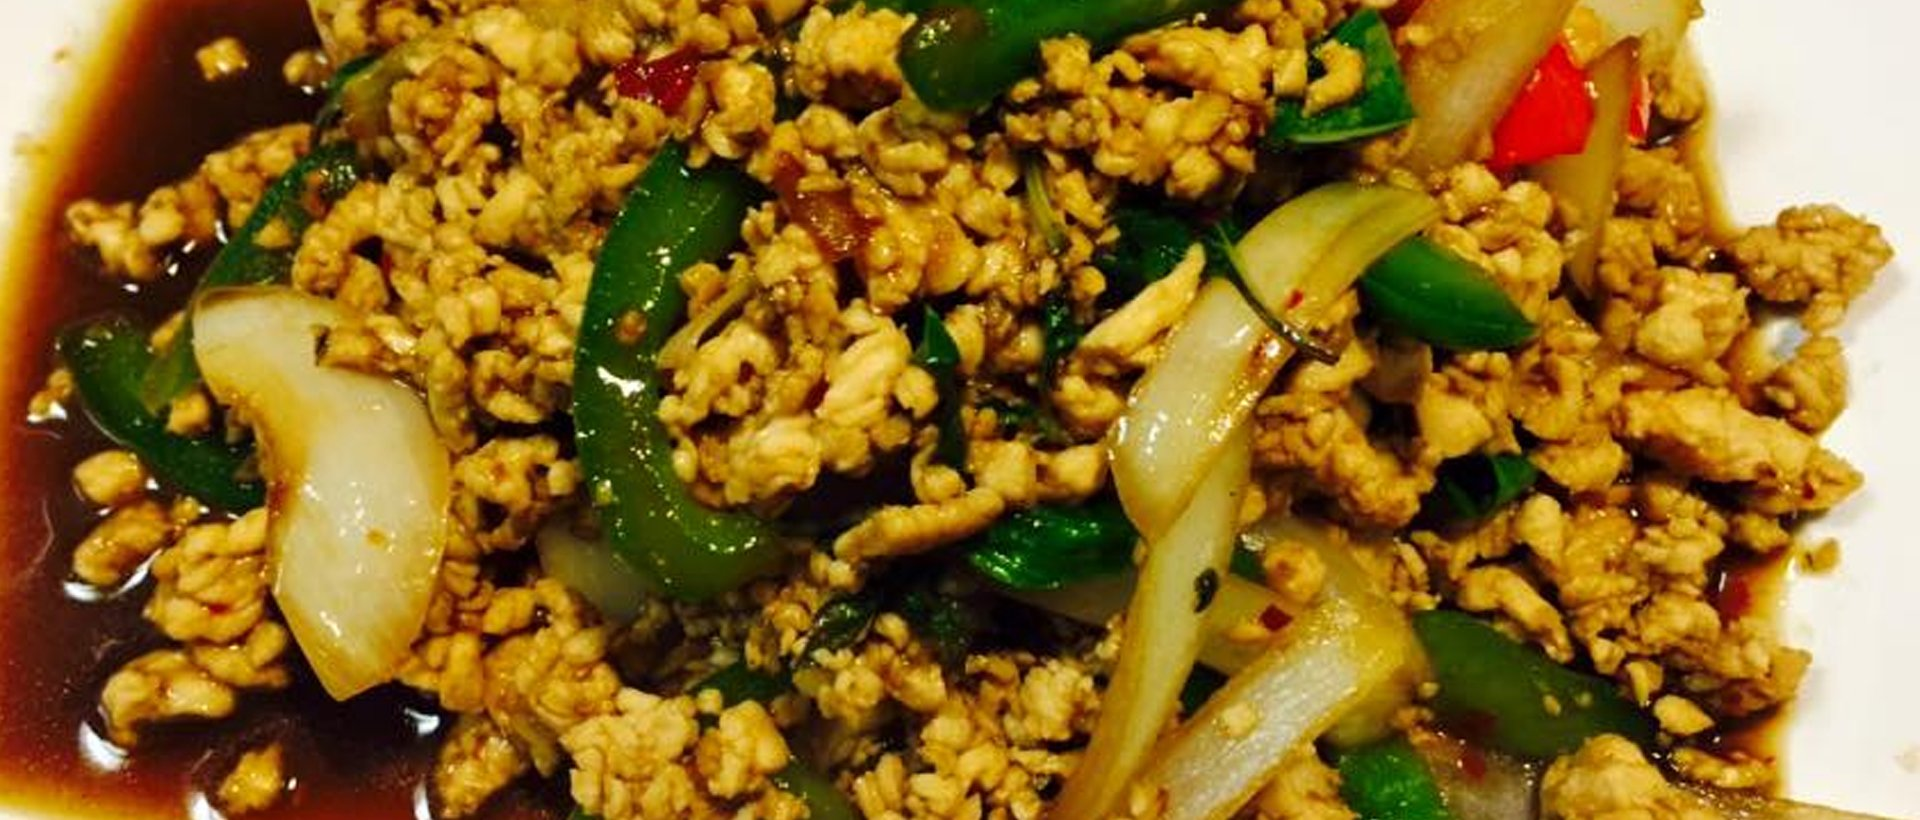 Thai Food Delivery Northridge Ca